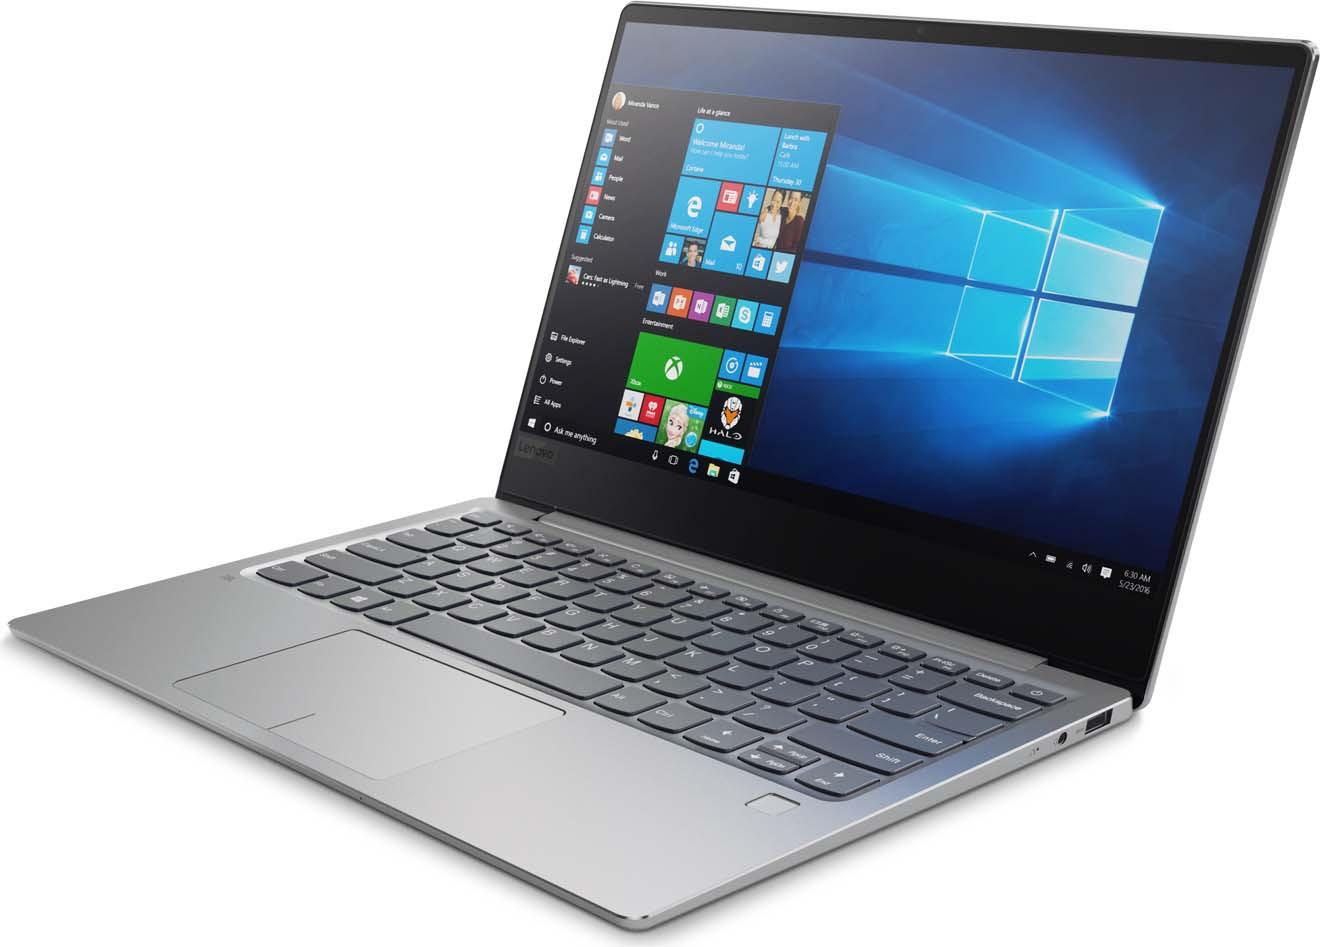 13.3 Ноутбук Lenovo IdeaPad 720S-13ARR 81BR000MRK, серебристый